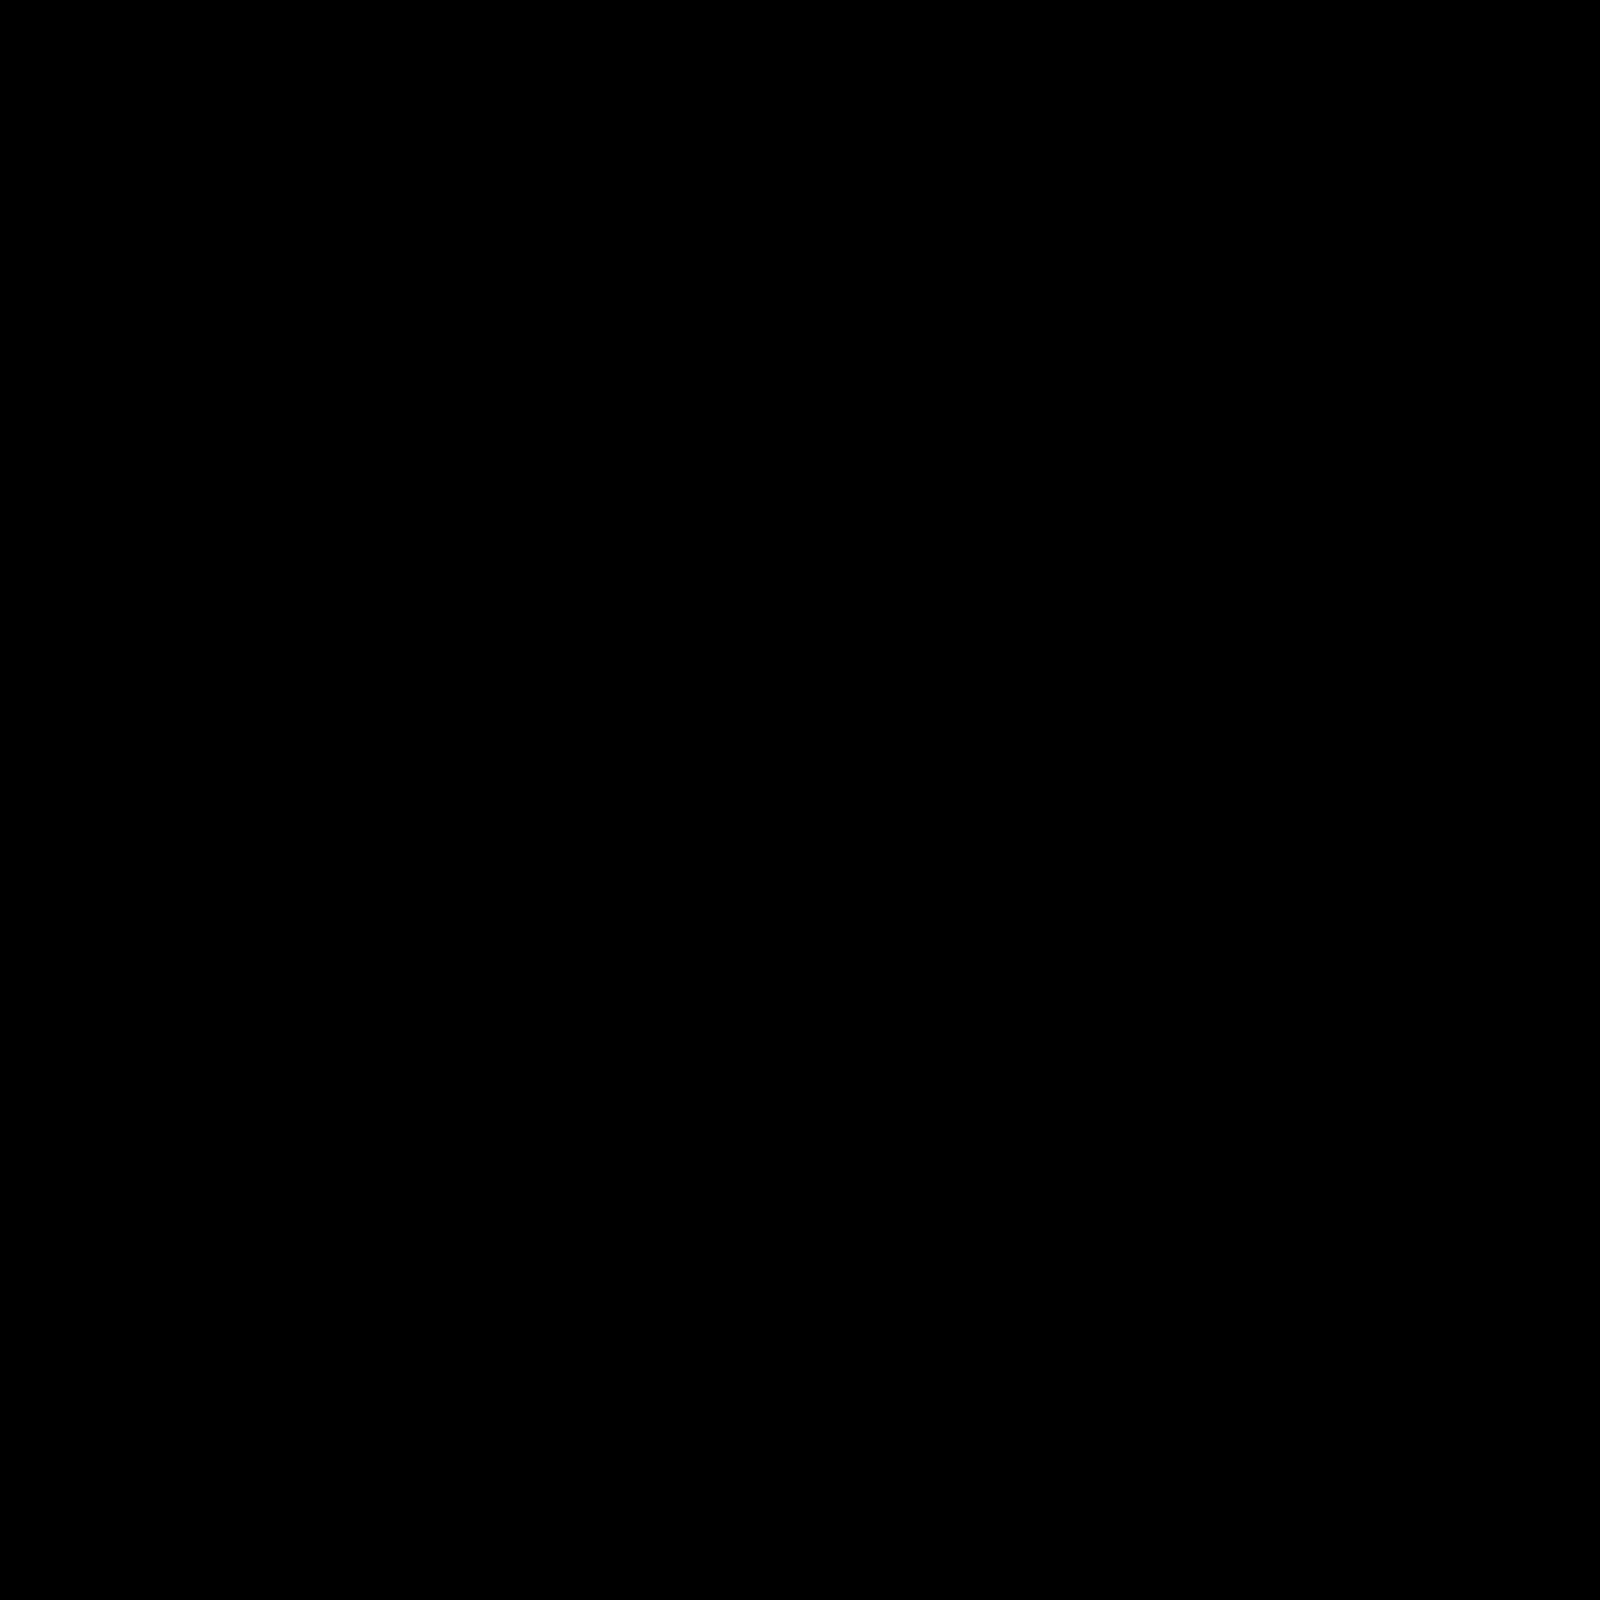 Football stance clipart jpg free download Иконка American Football Defensive Stance - скачать бесплатно в PNG ... jpg free download